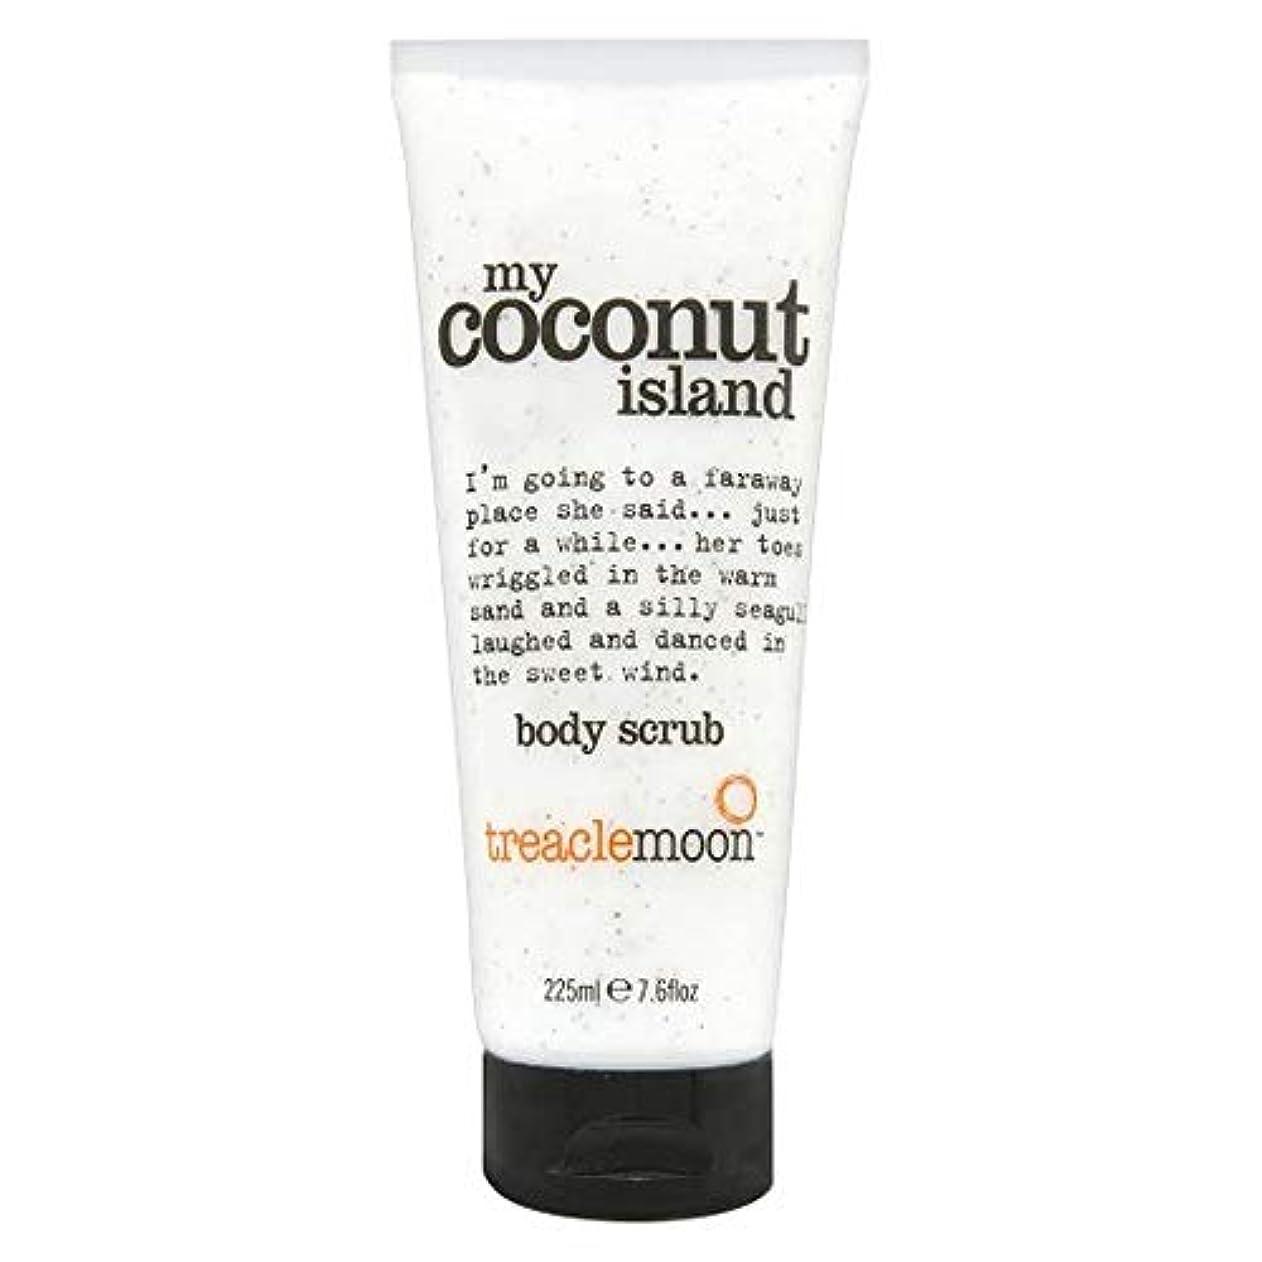 [Treacle Moon ] 私のココナッツ島ボディスクラブ225ミリリットルをTreaclemoon - Treaclemoon My Coconut Island Body Scrub 225Ml [並行輸入品]